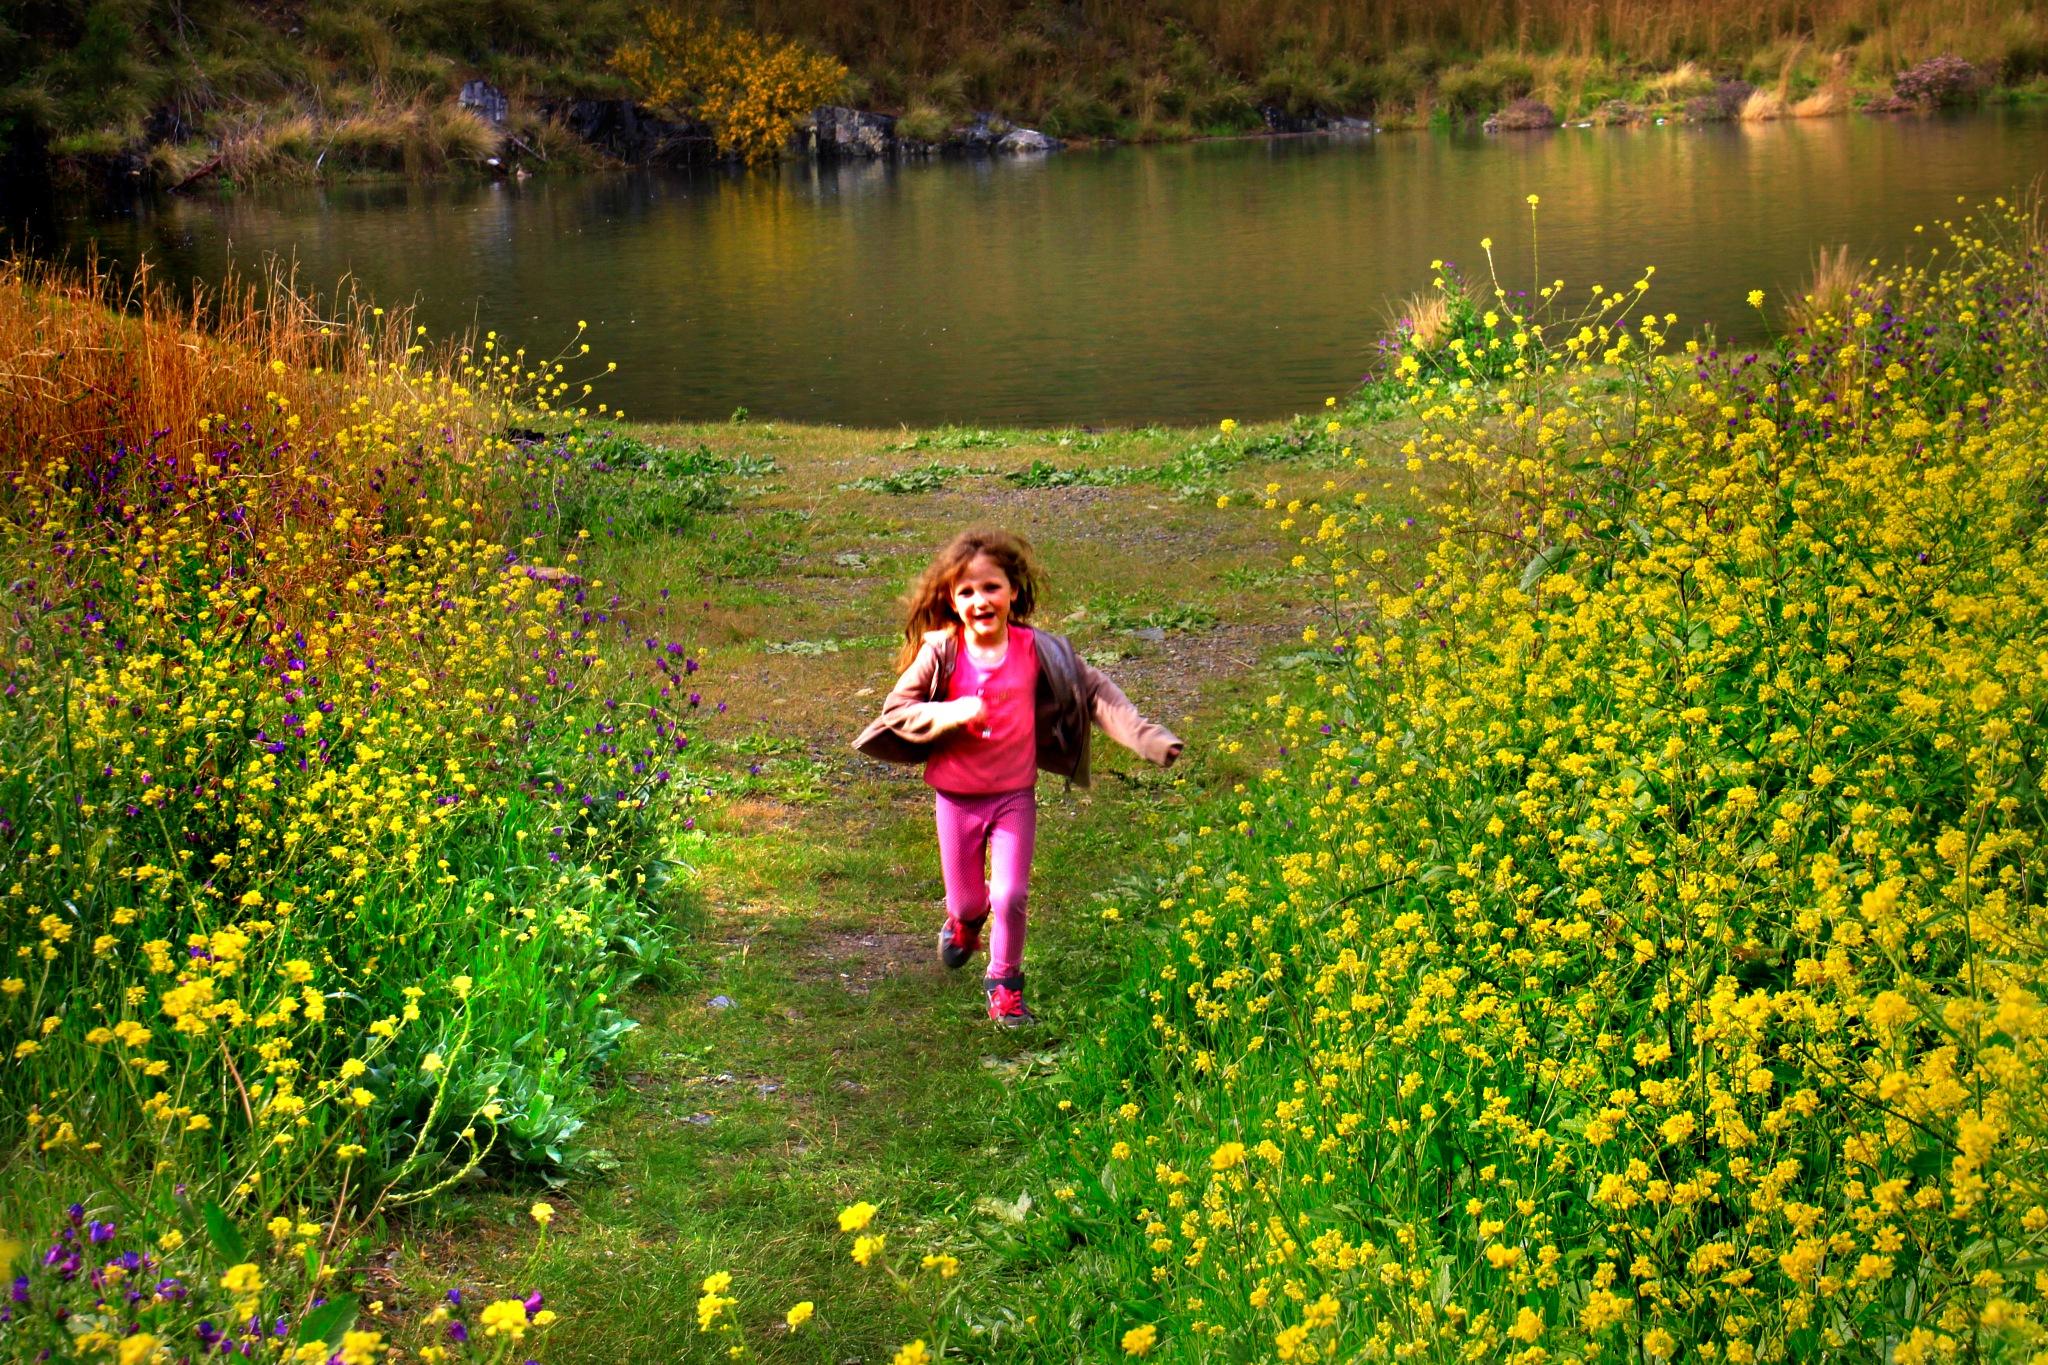 Running through the flowers by Nauta Piscatorque